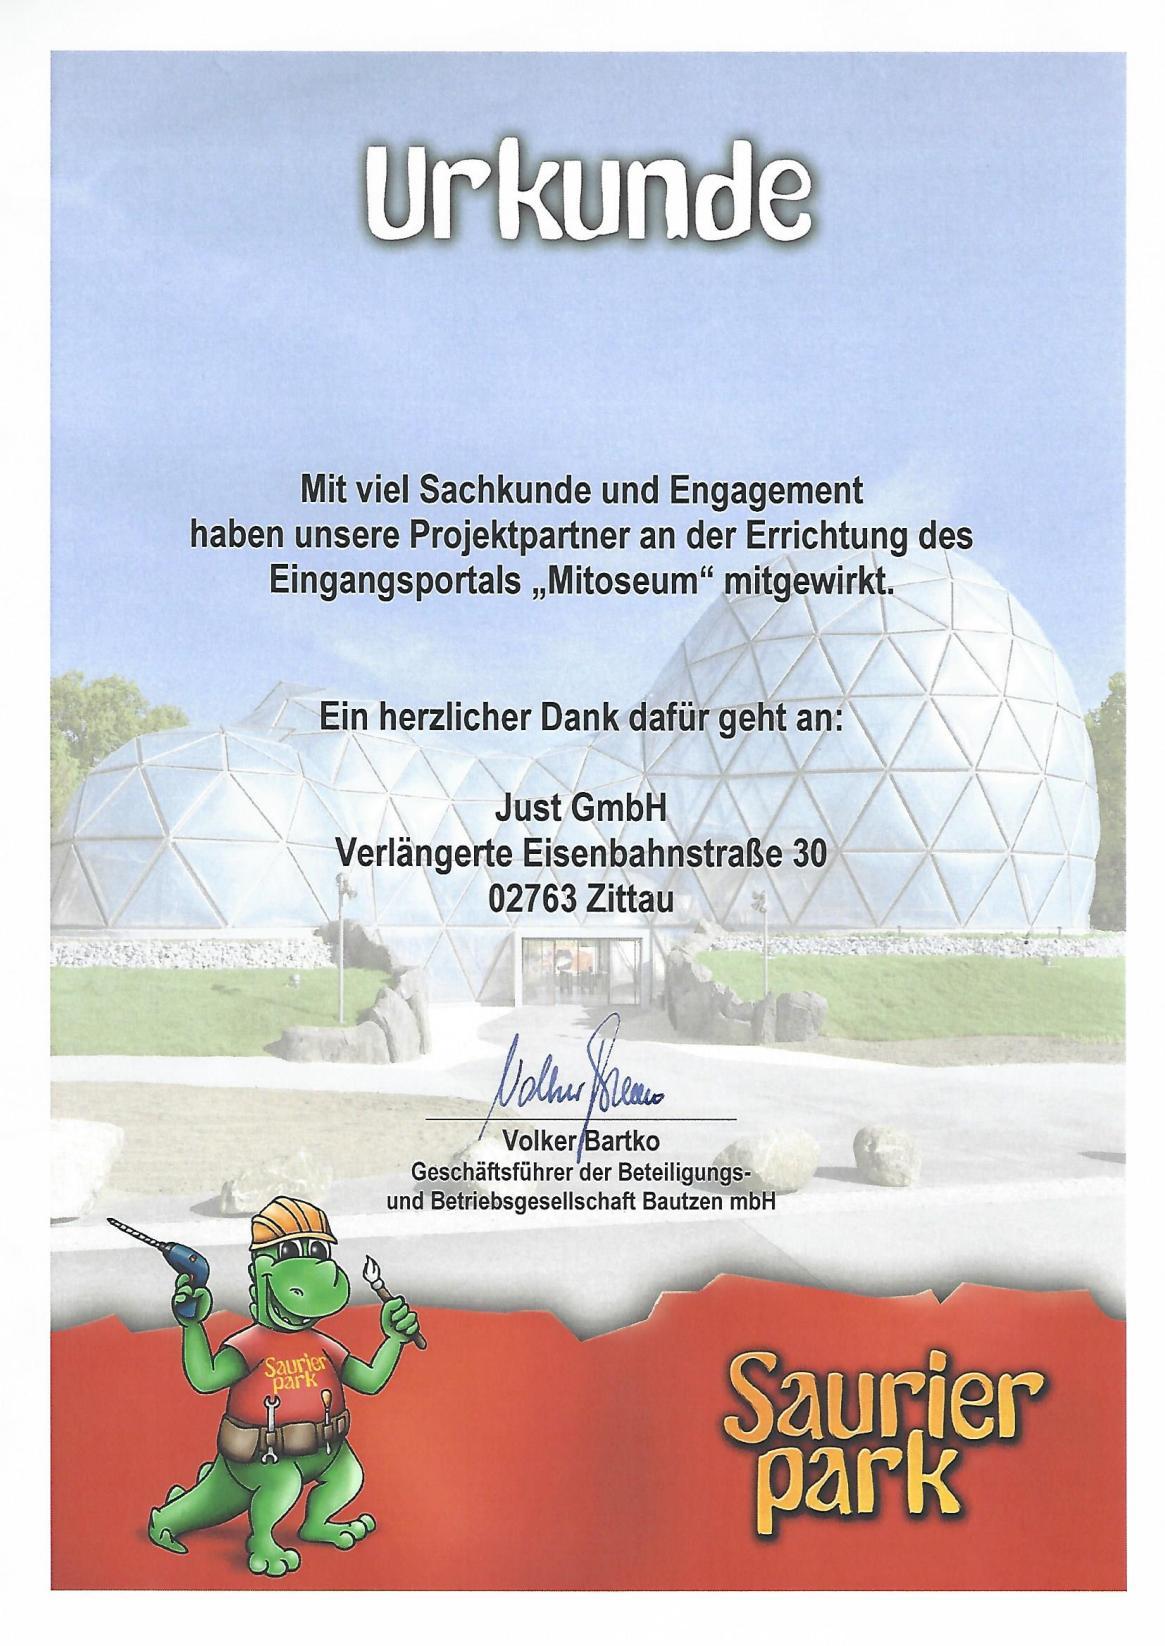 Stimme Saurier JUST GmbH